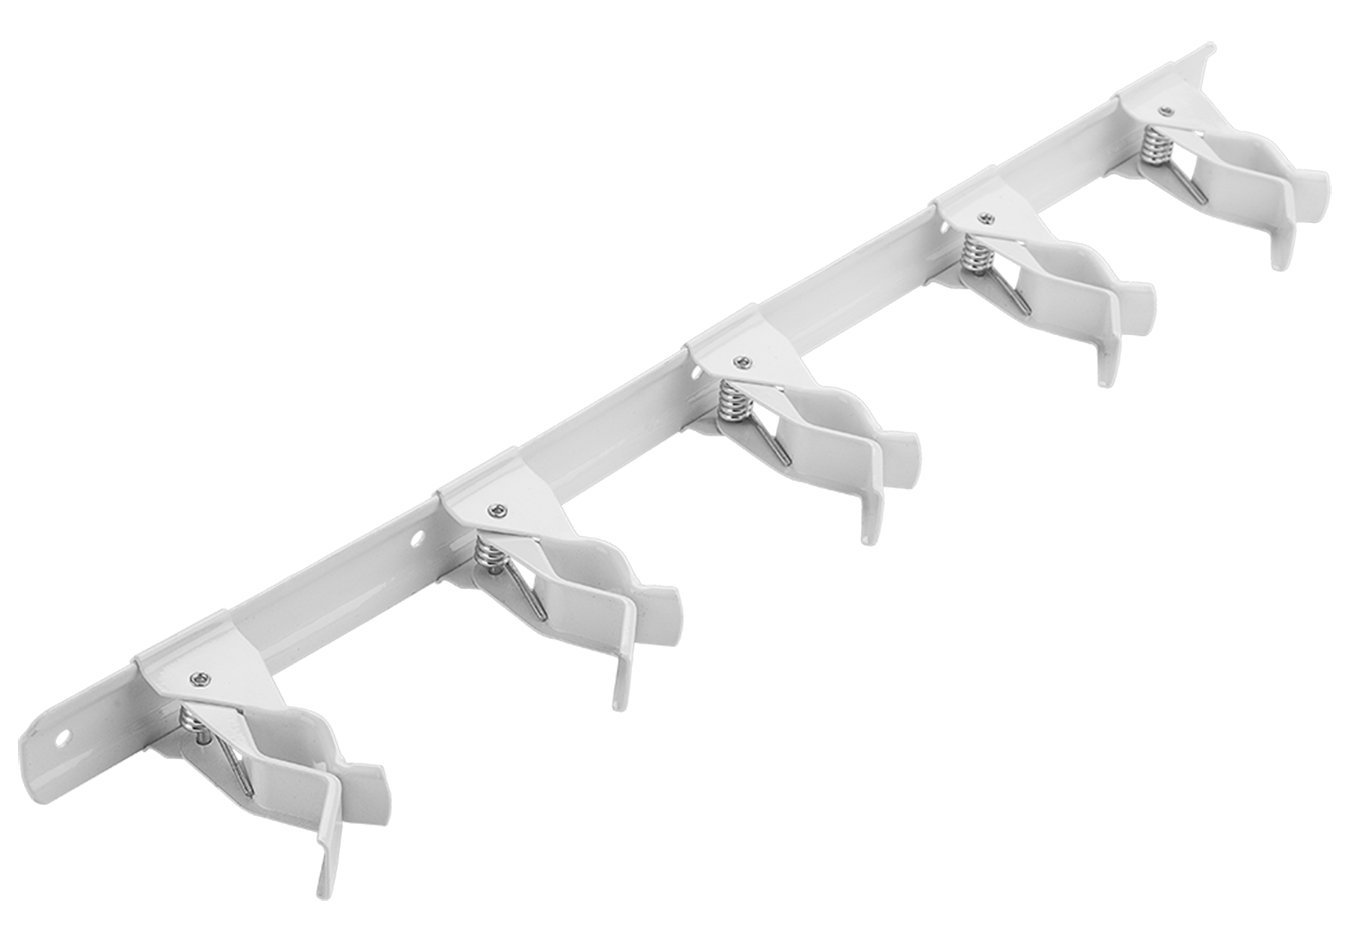 National Hardware N112 078 V8519 Tool Storage Clip in White finish